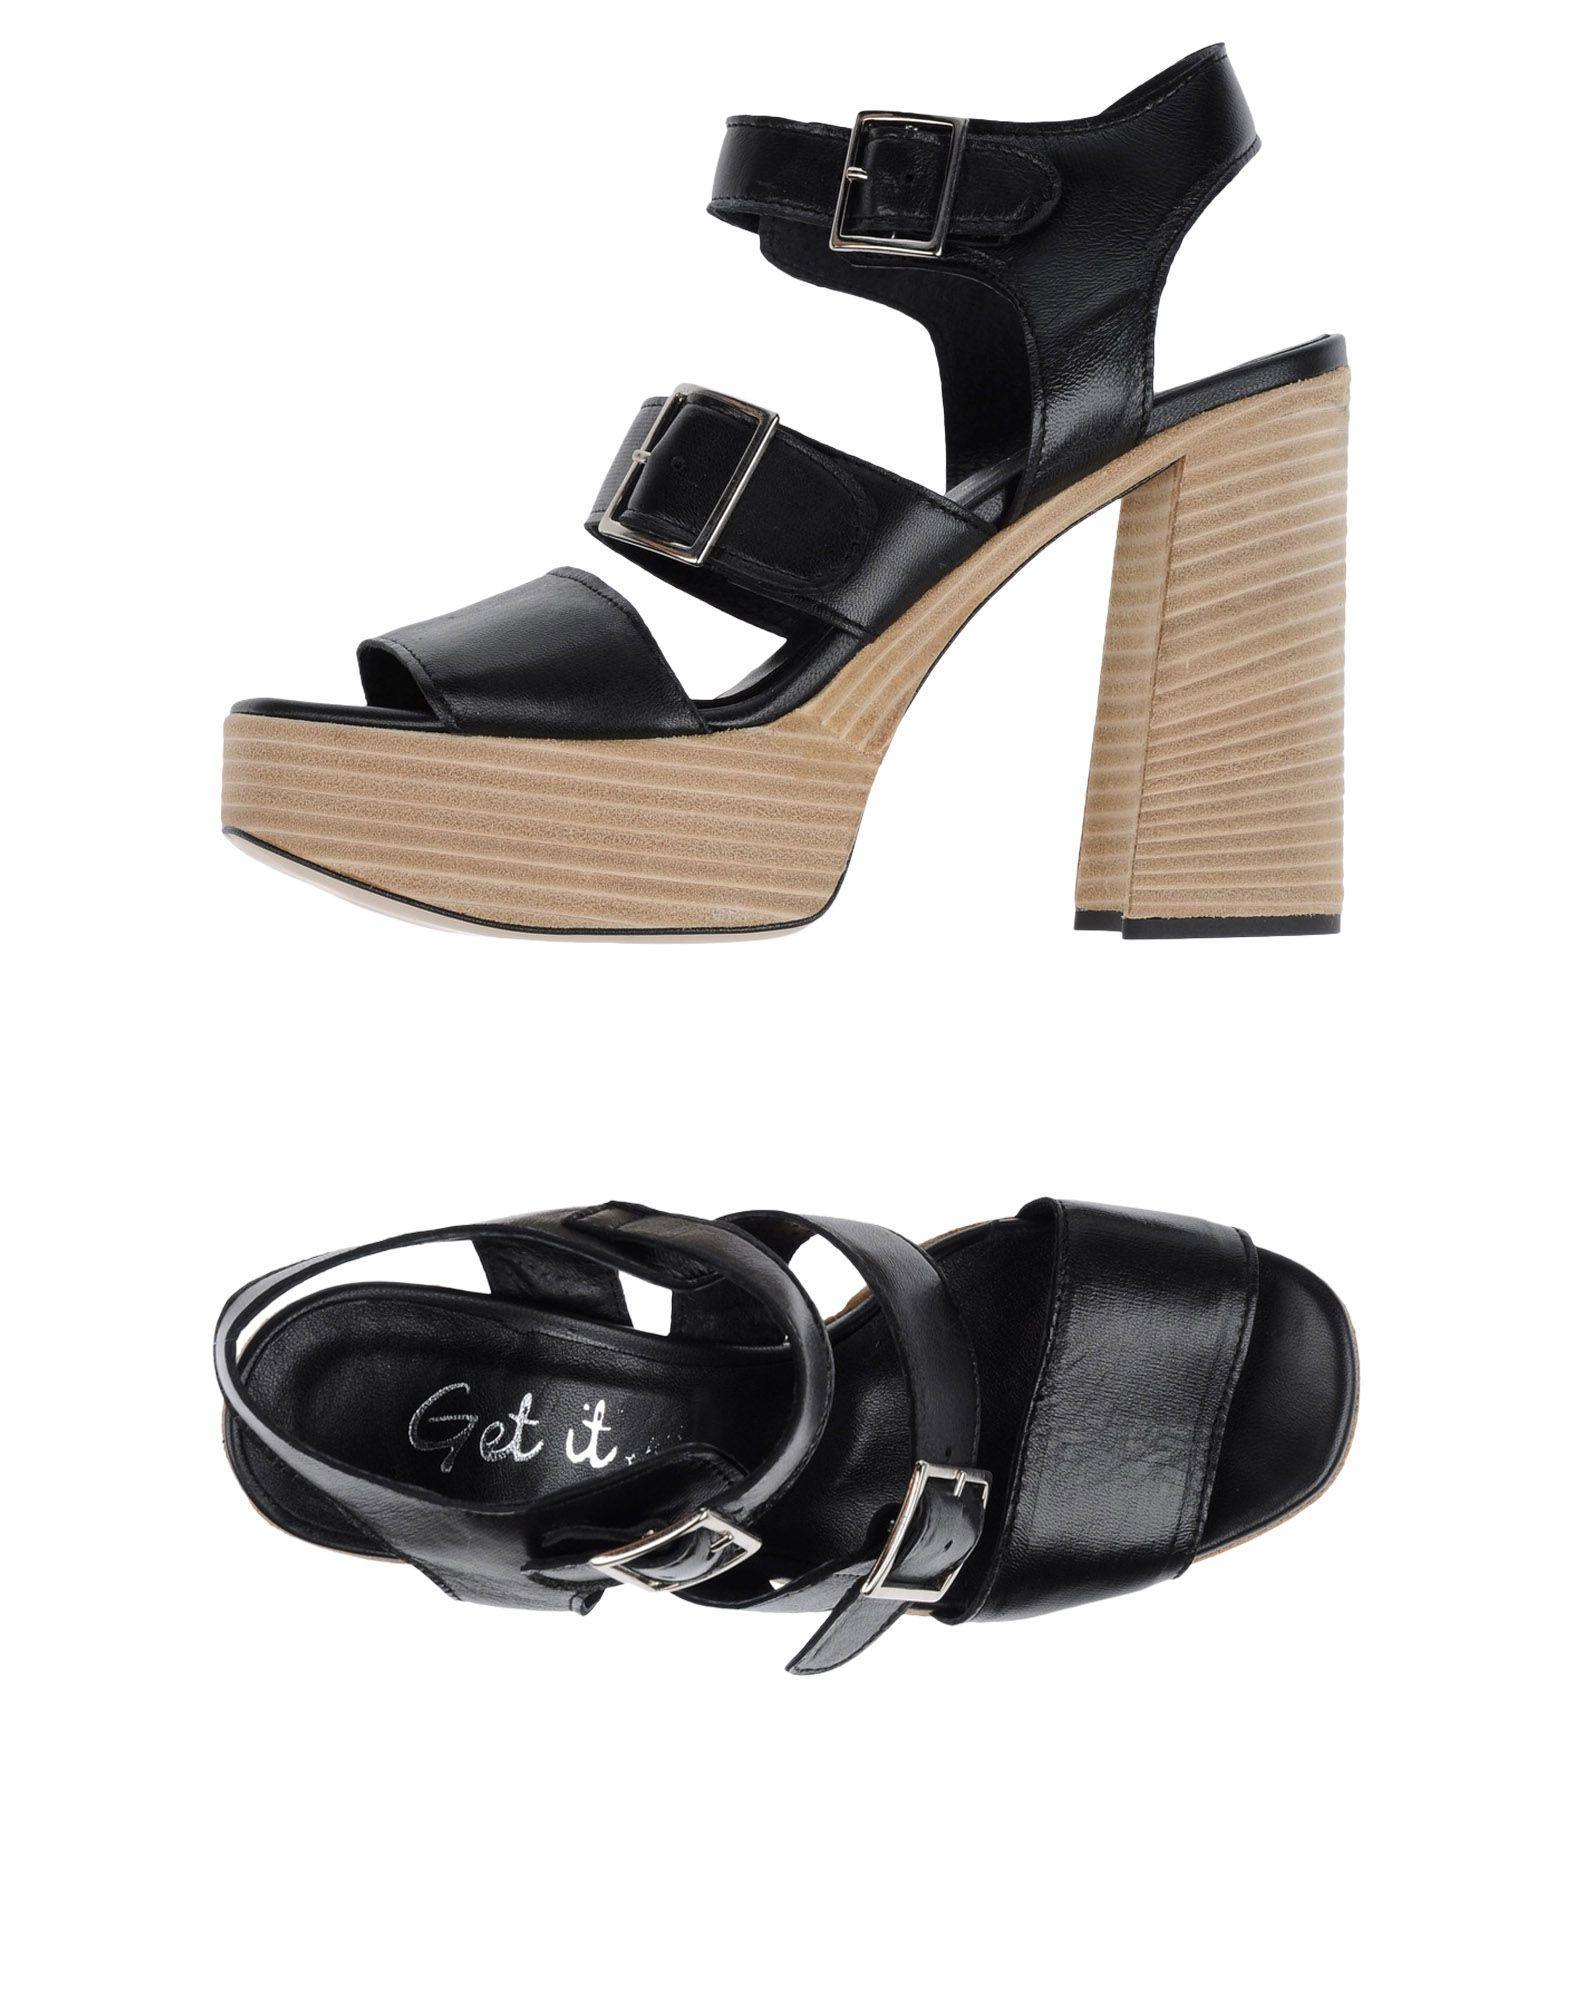 Get It Sandalen Damen  11241715AB Gute Qualität beliebte Schuhe